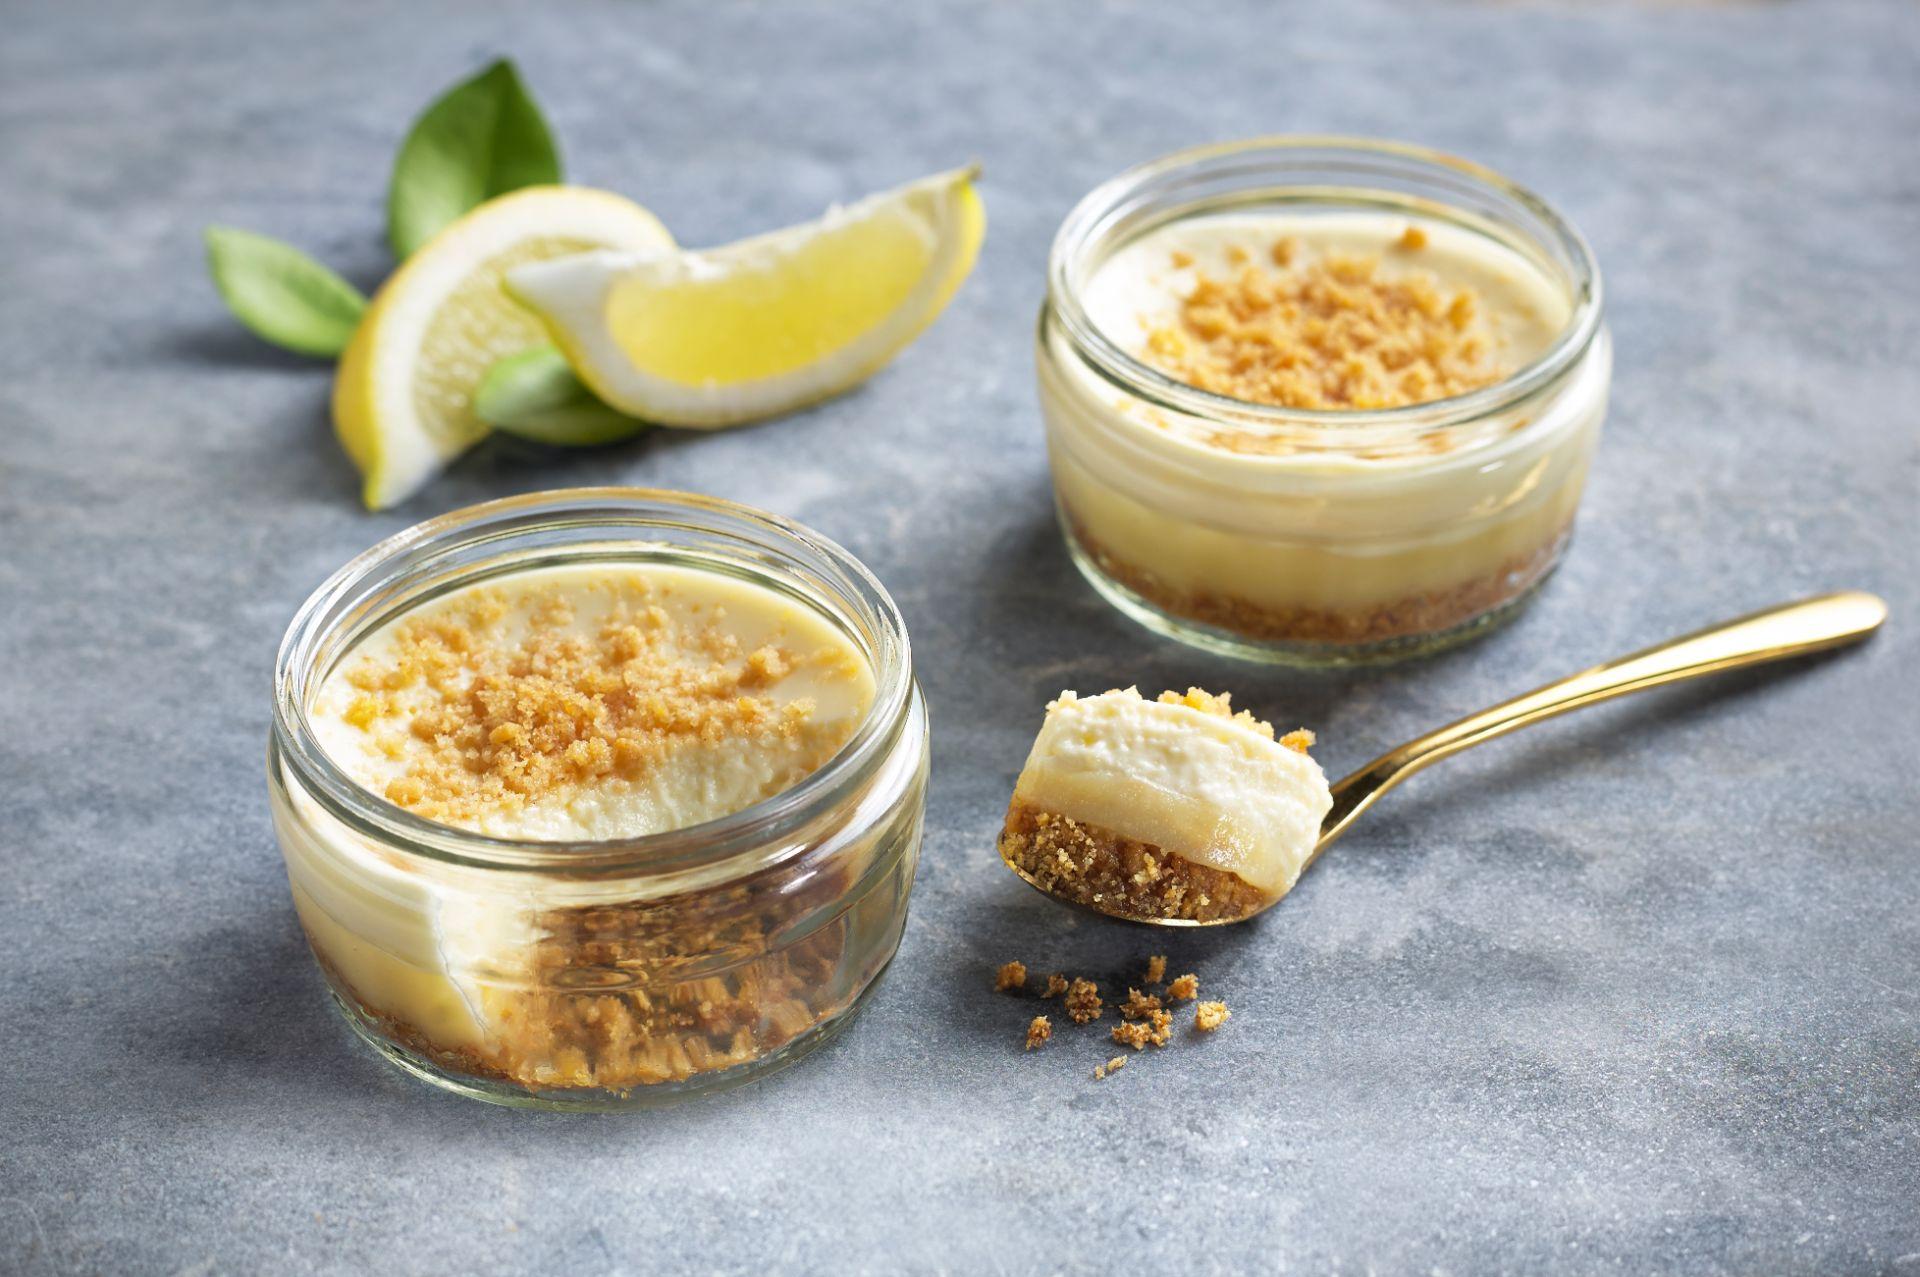 Gü Lemon cheesecake on glass plate